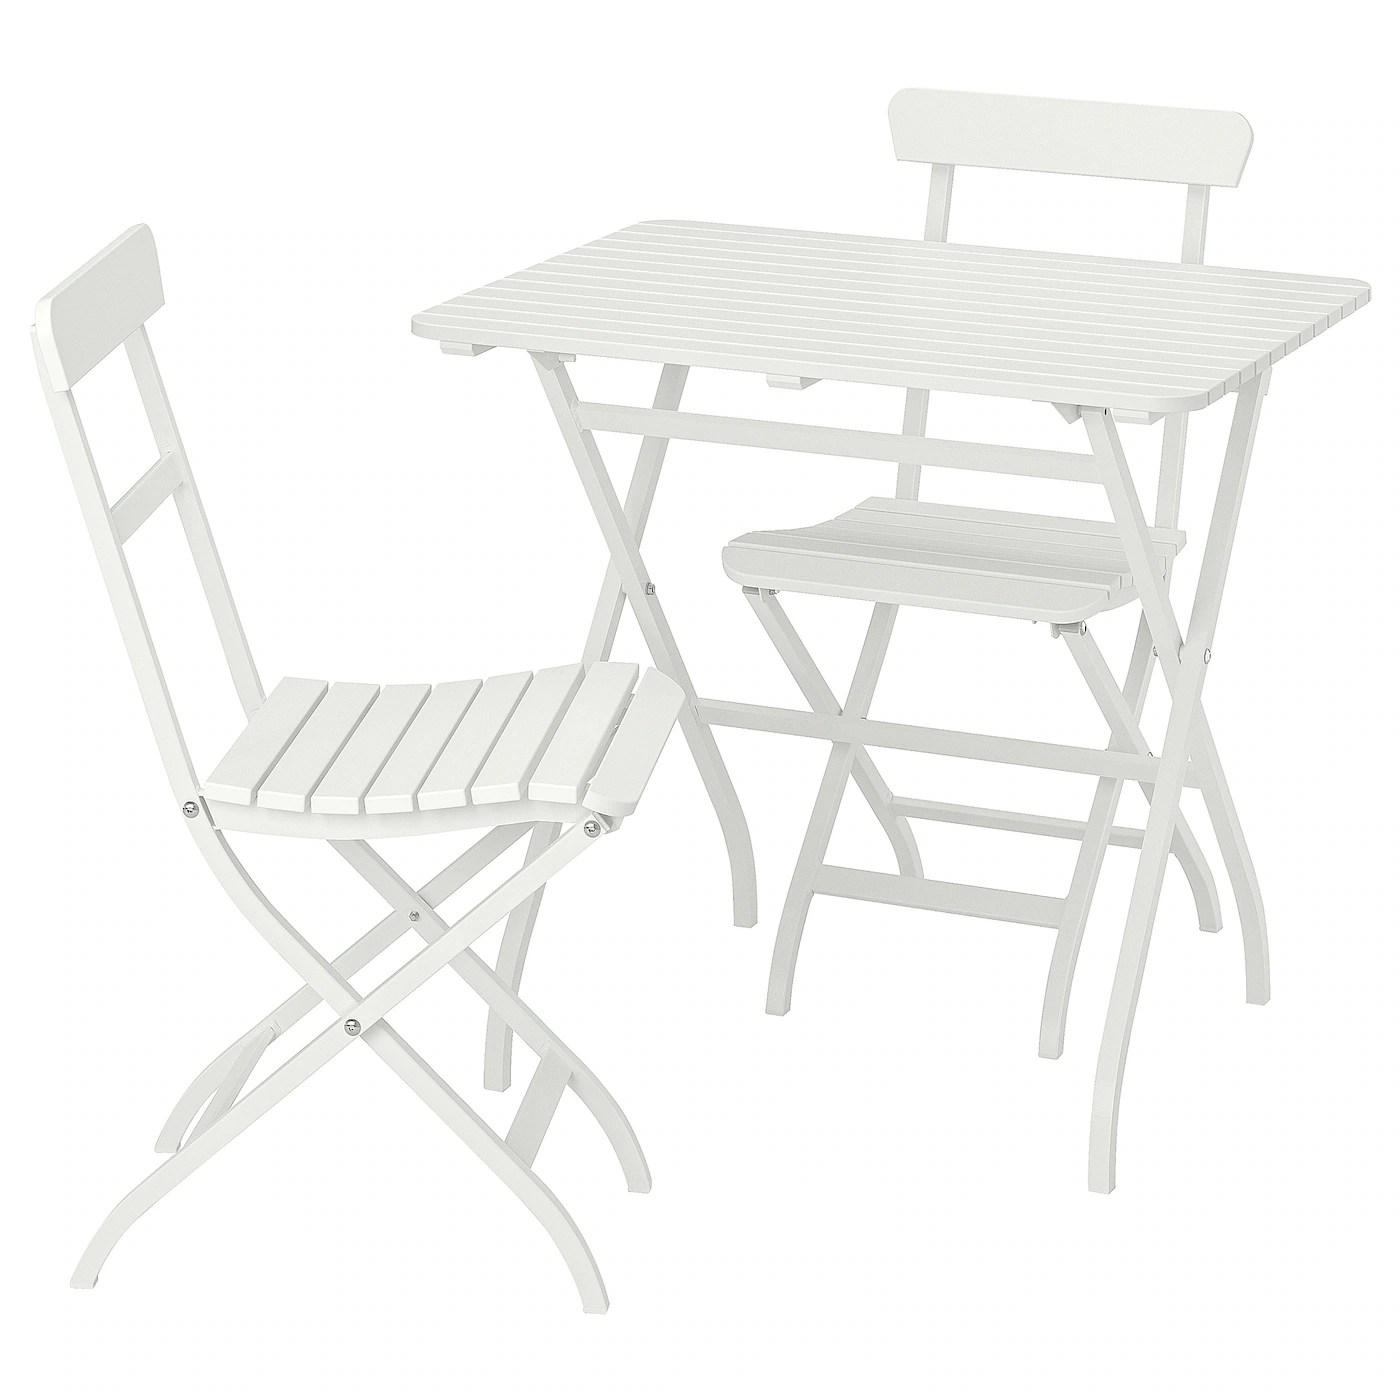 malaro table 2 chaises exterieur blanc